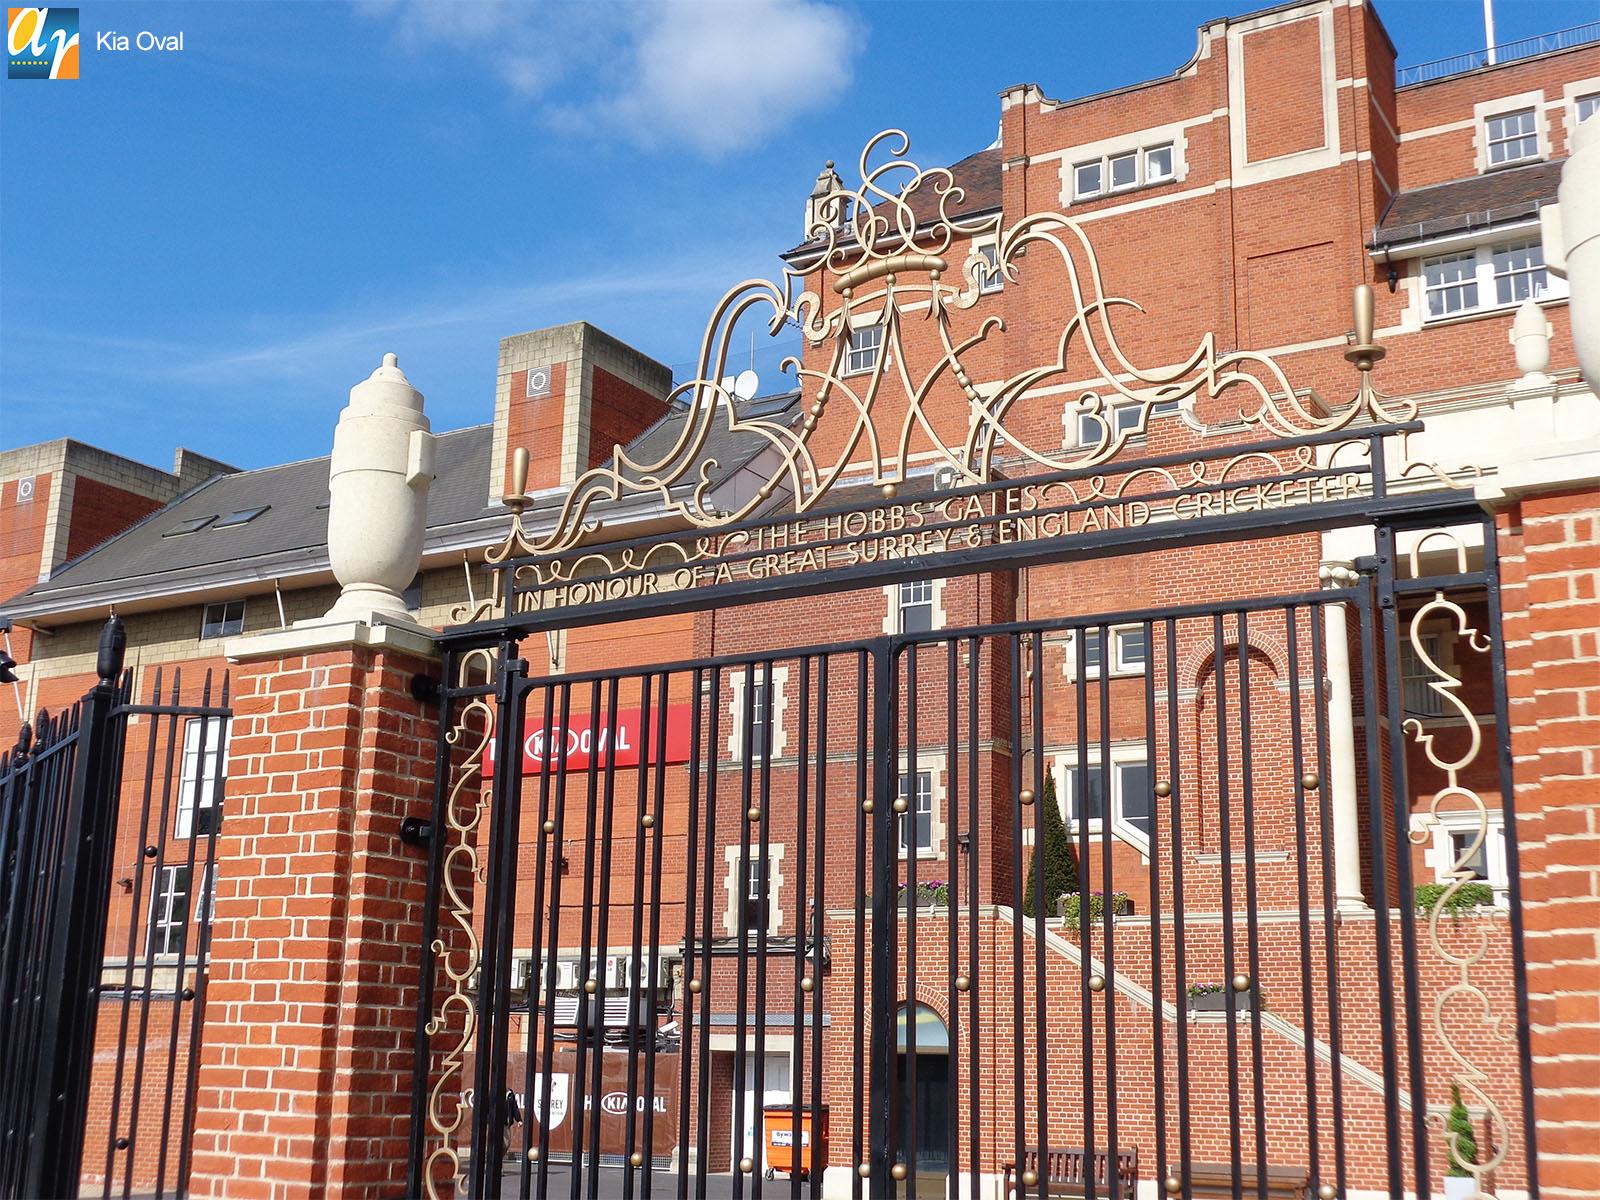 Kia Oval Cricket ground Jack Hobbs gates